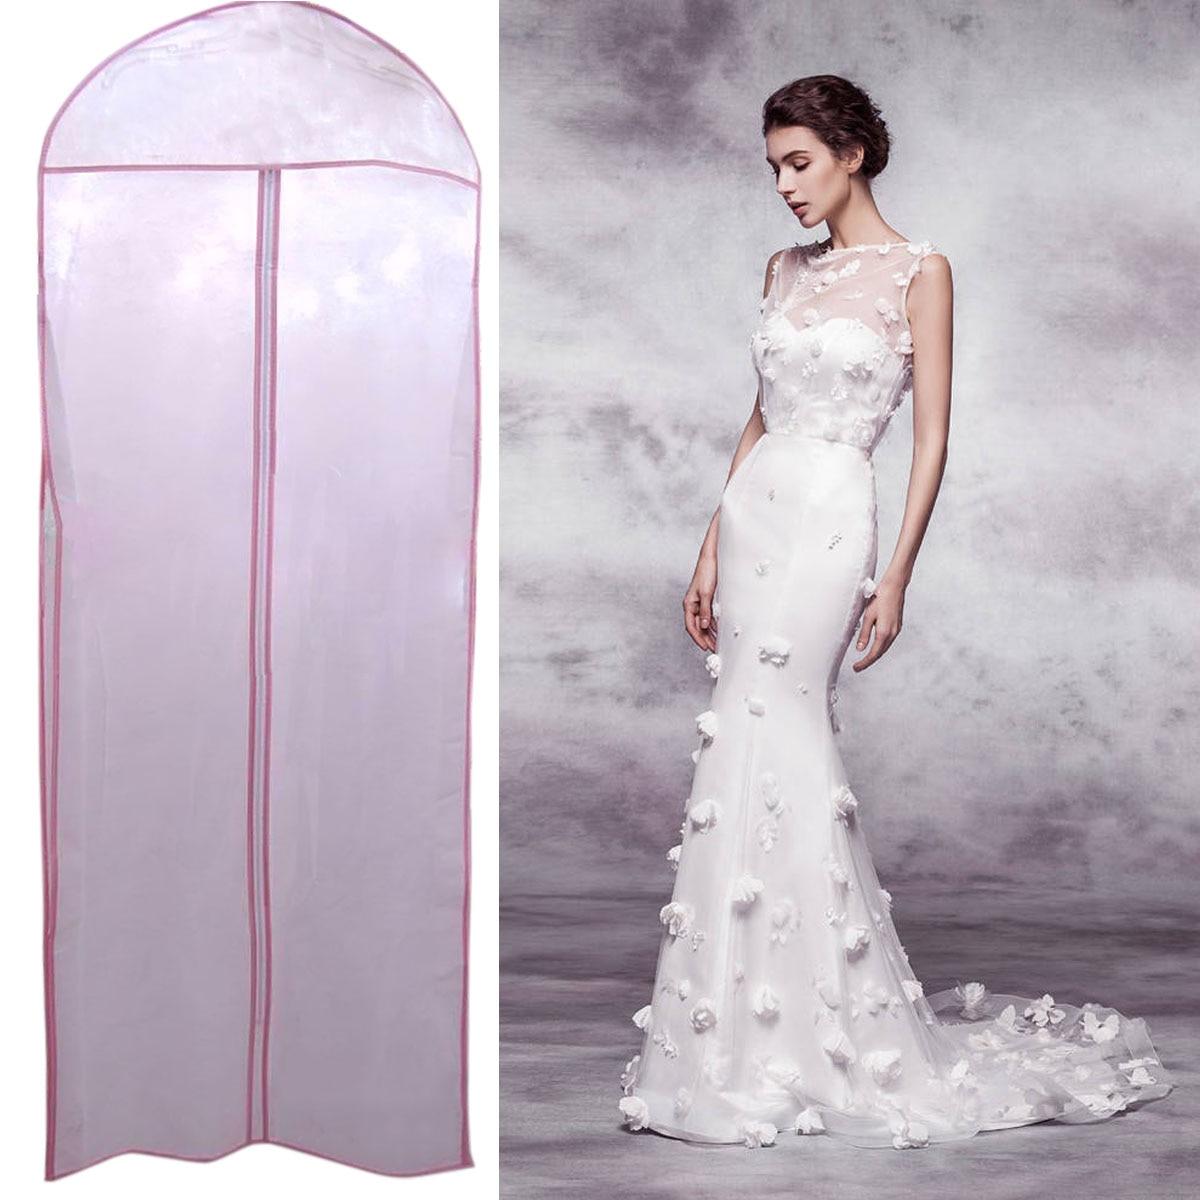 Wedding Gown Preservation Bag: 180 X 58 X 8cm Women Bridal Wedding Dress Gown Robe